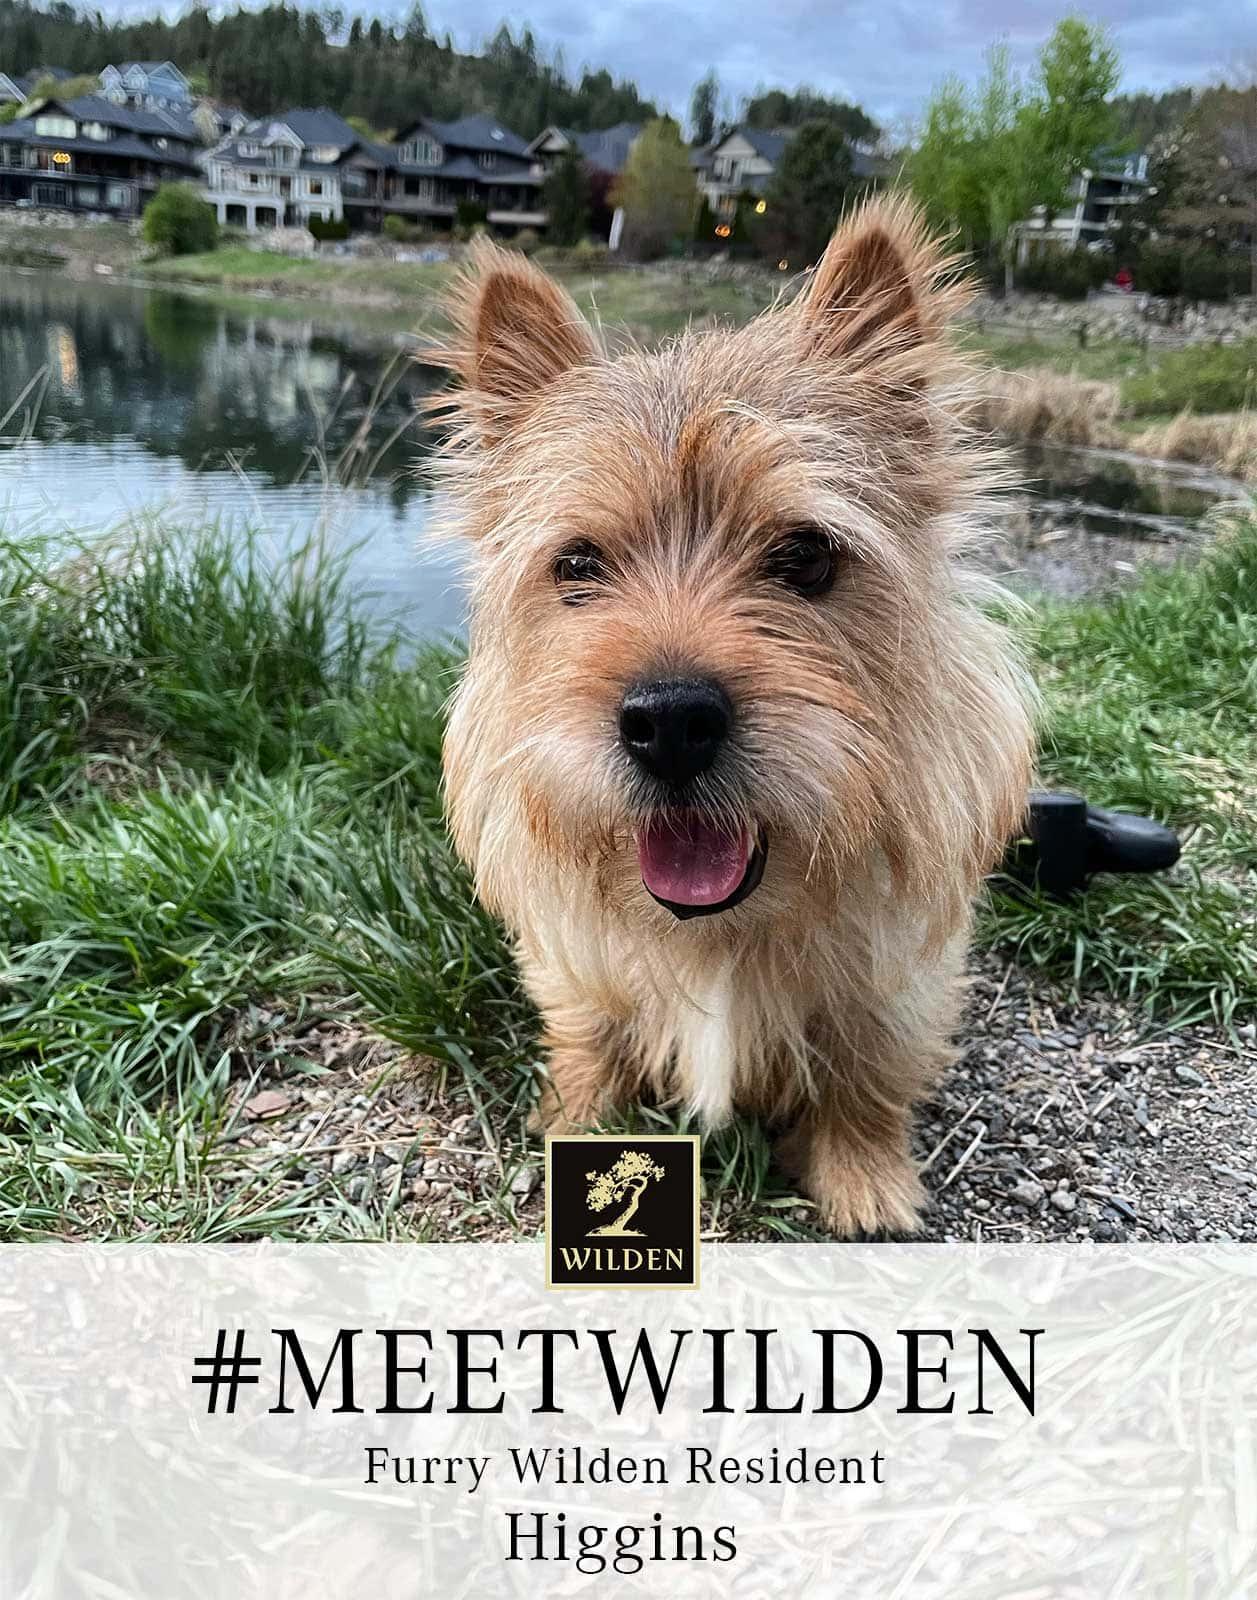 Norwich Terrier Higgins at Hidden Lake Park in Wilden image